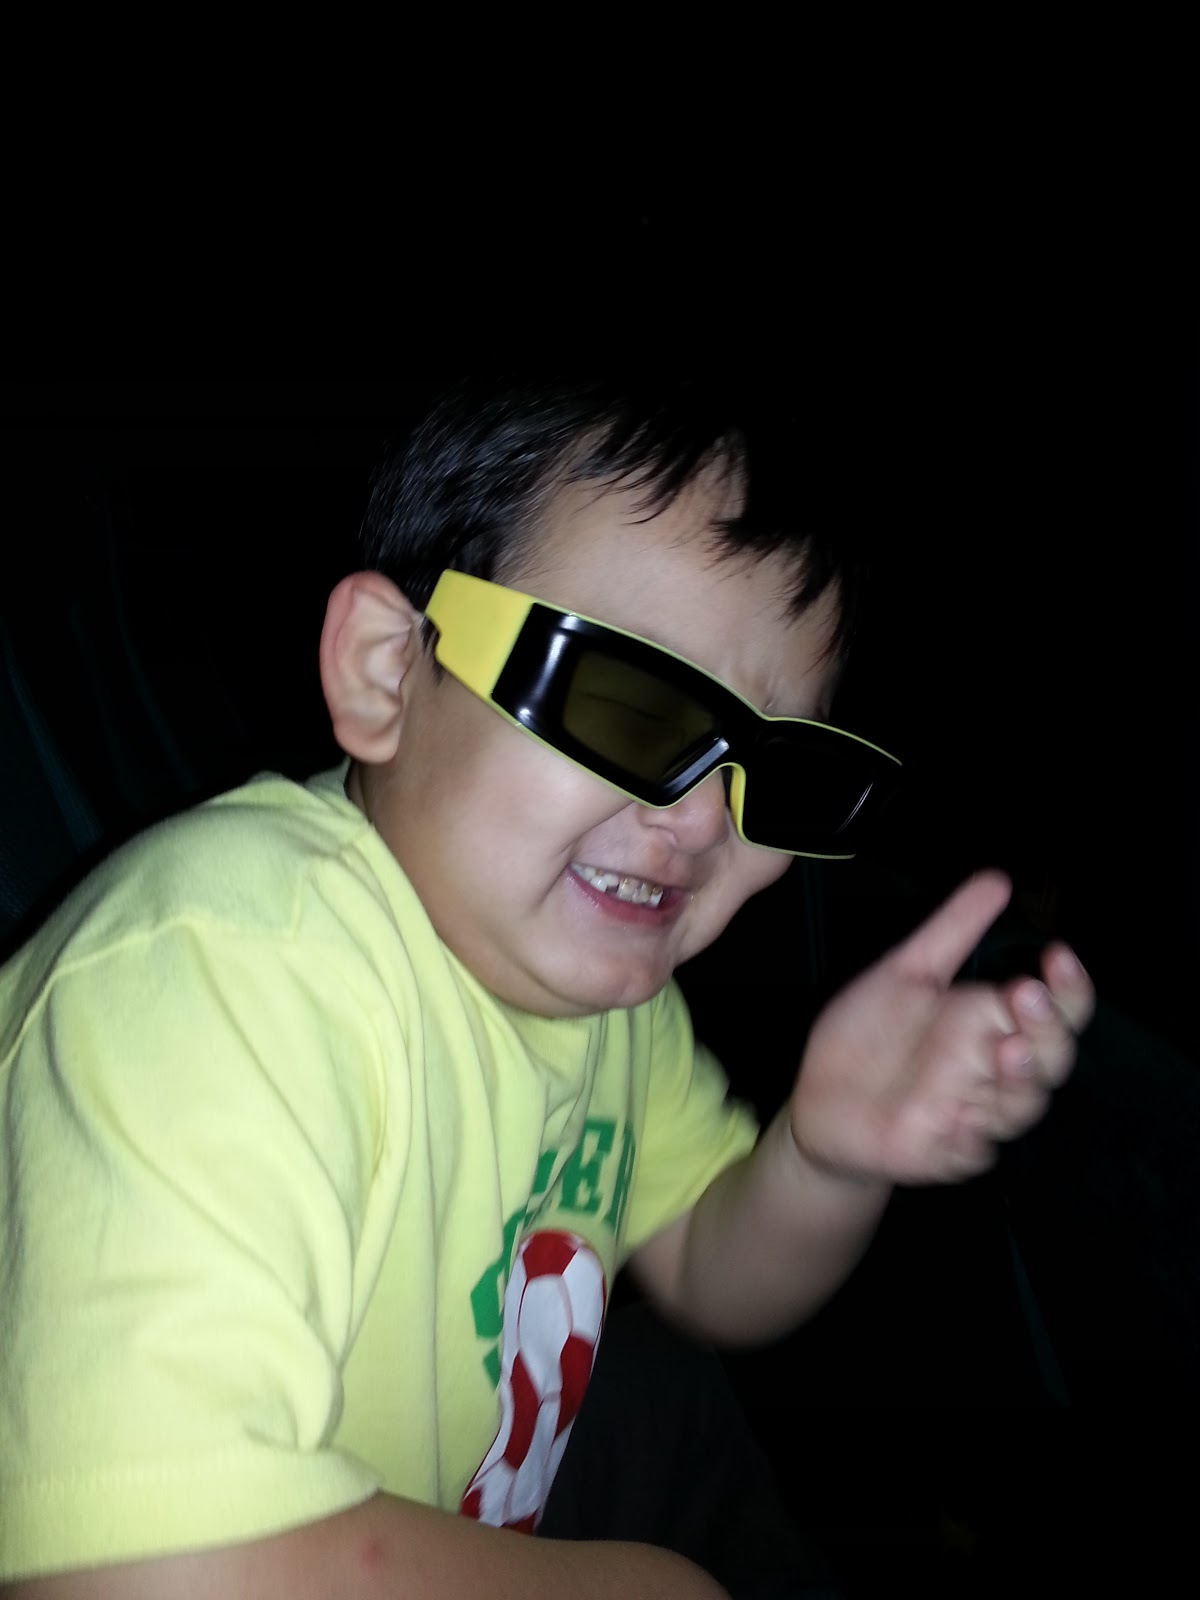 Sherry Rambling 2012 Lgs Slim Fit Youth Boy Giant Leap Merah Xl Movie Review Frankenweenie